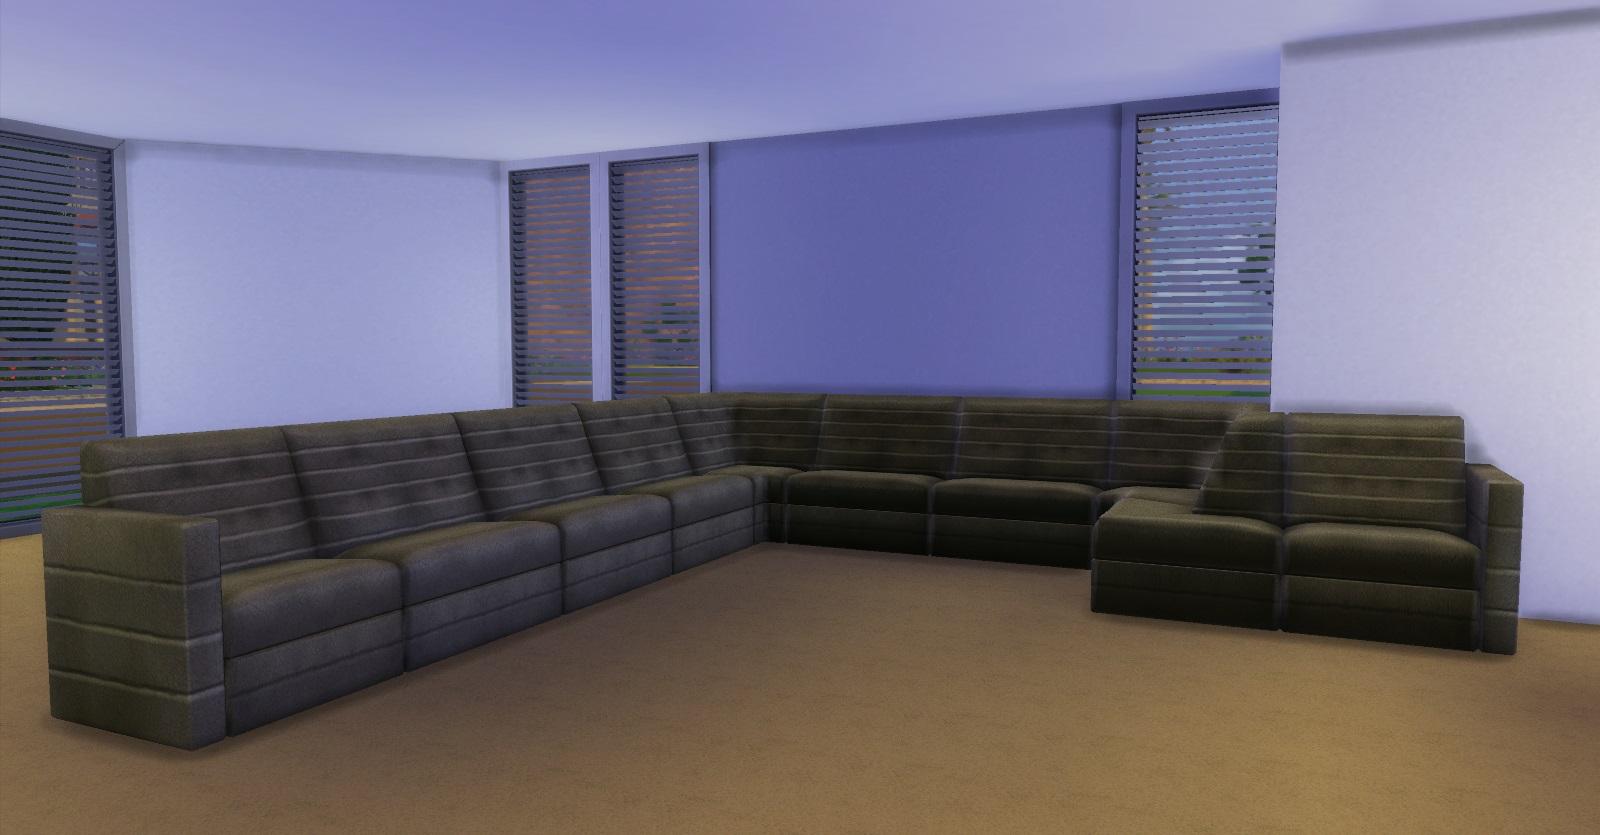 How To Make A Sectional Sofa On Sims 4 Okaycreationsnet